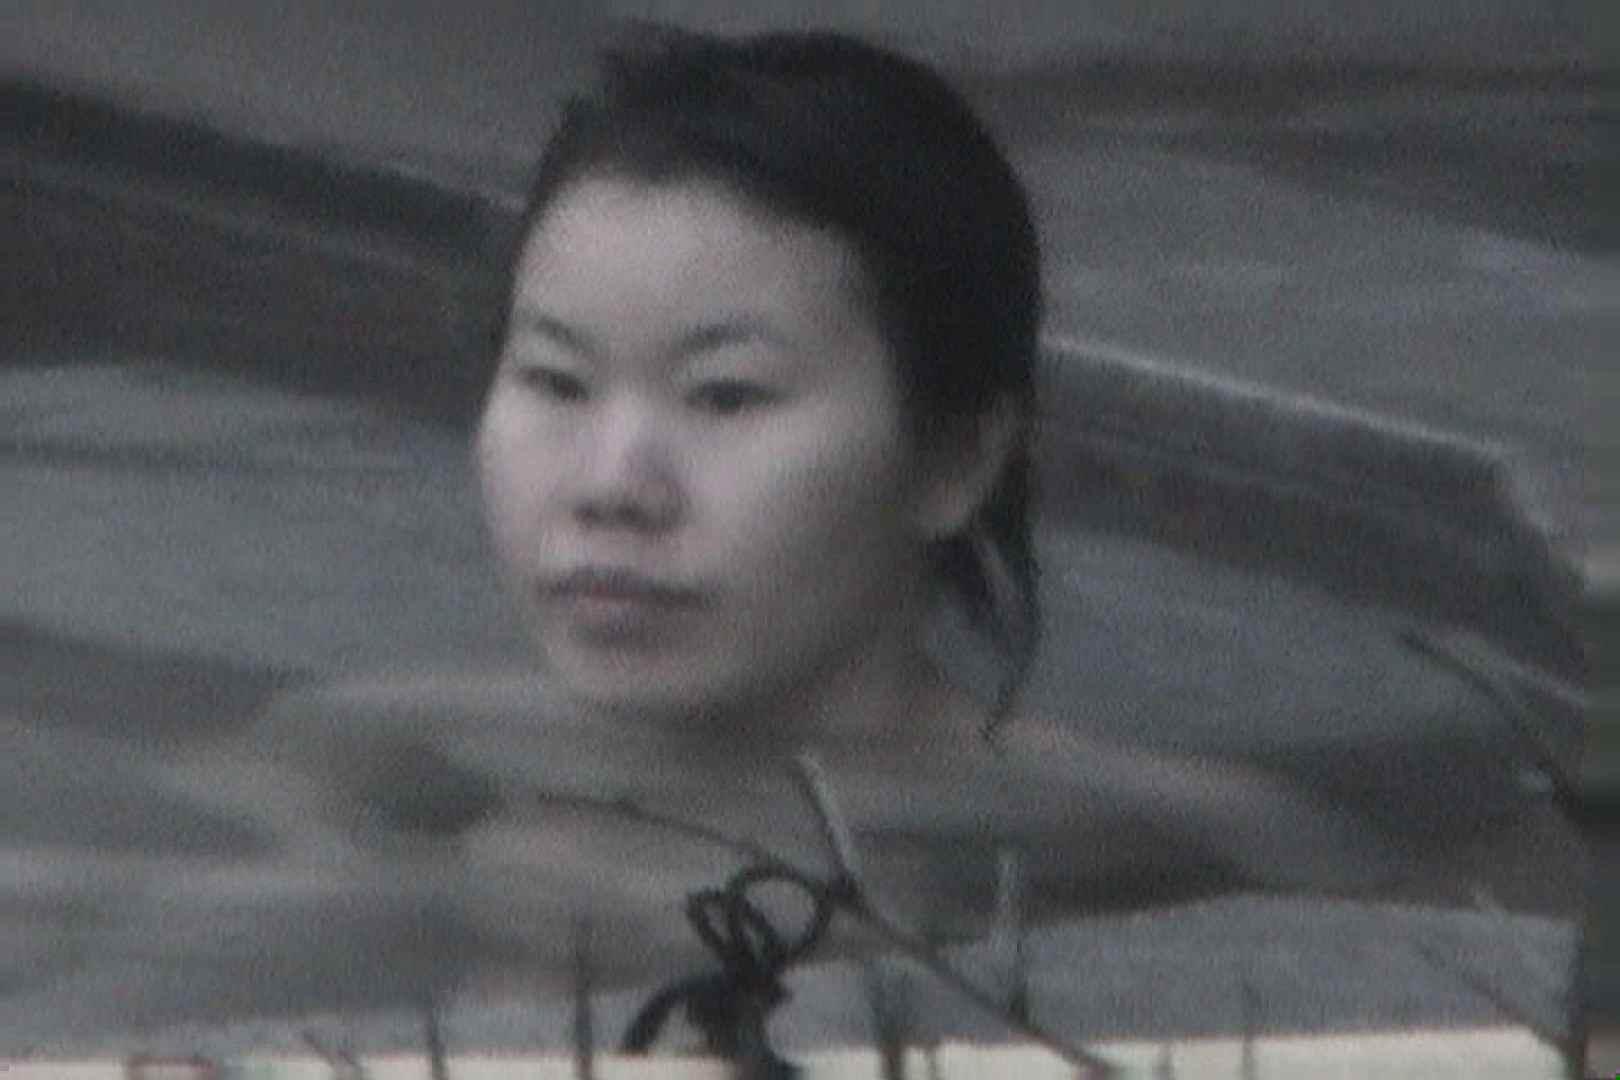 Aquaな露天風呂Vol.556 露天風呂編  99PIX 24